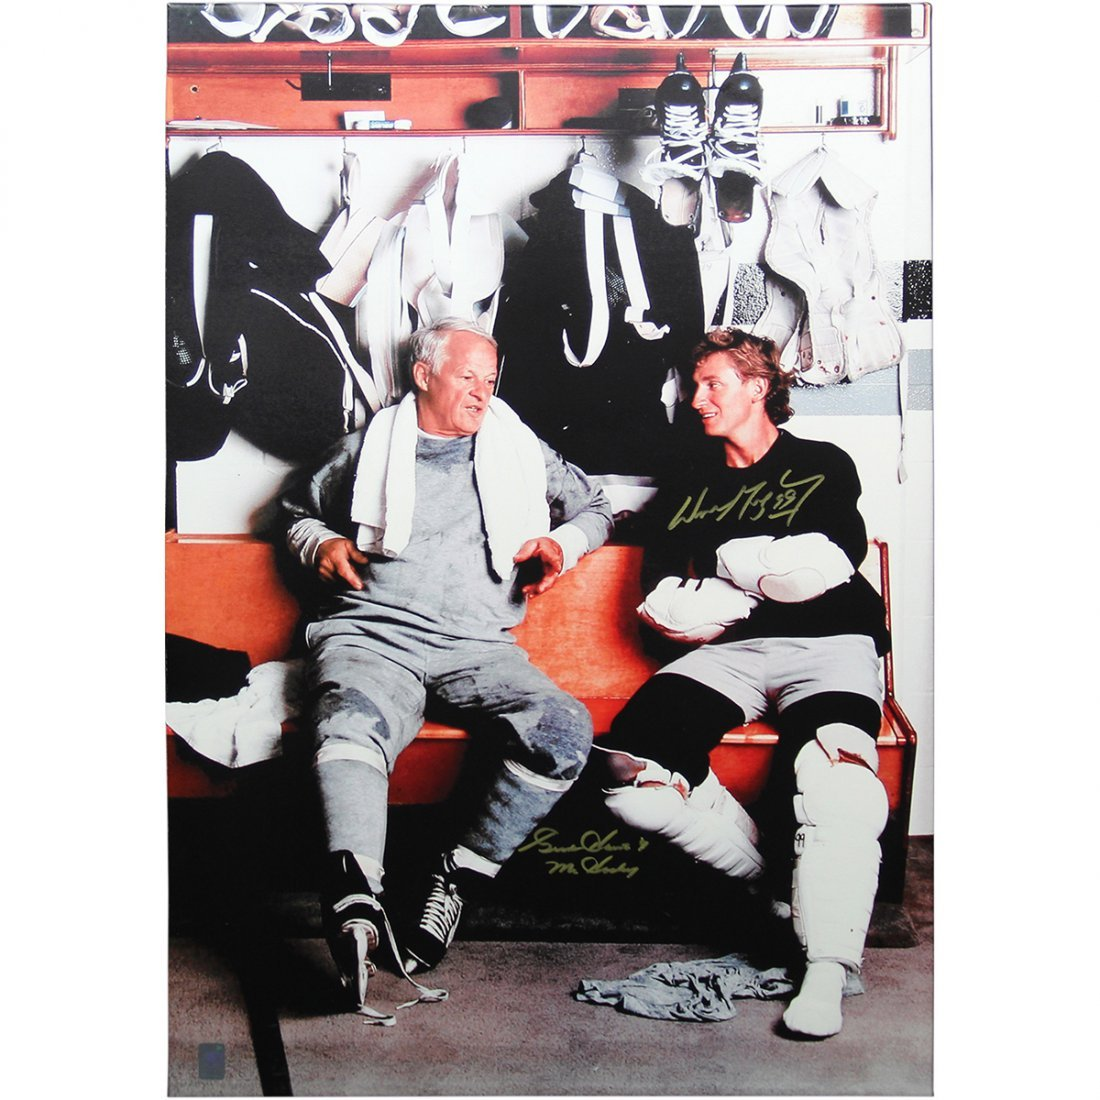 Wayne Gretzky and Gordie Howe Signed and Framed Canvas